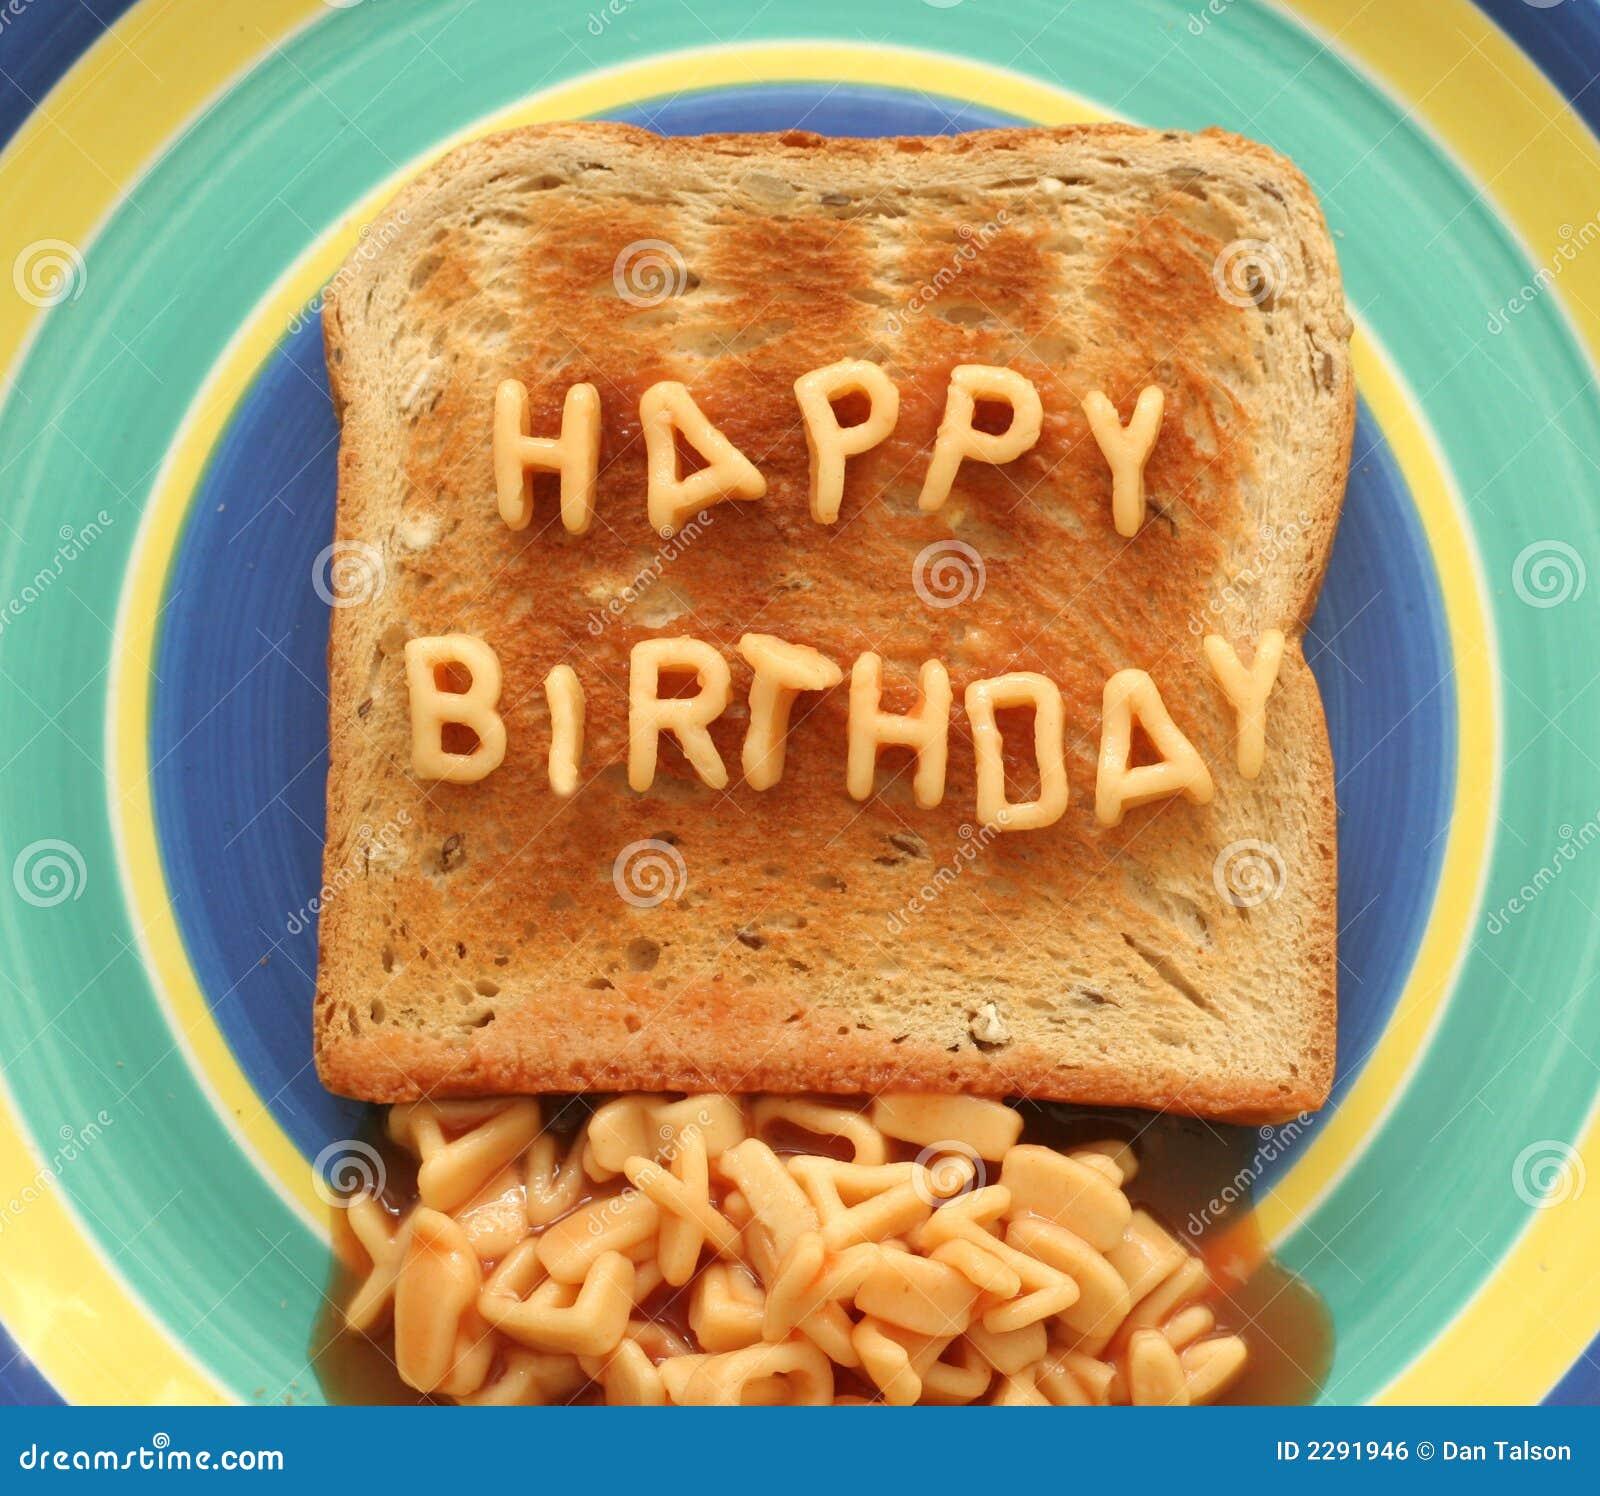 happy birthday toast Happy birthday toast stock photo. Image of snack, health   2291946 happy birthday toast